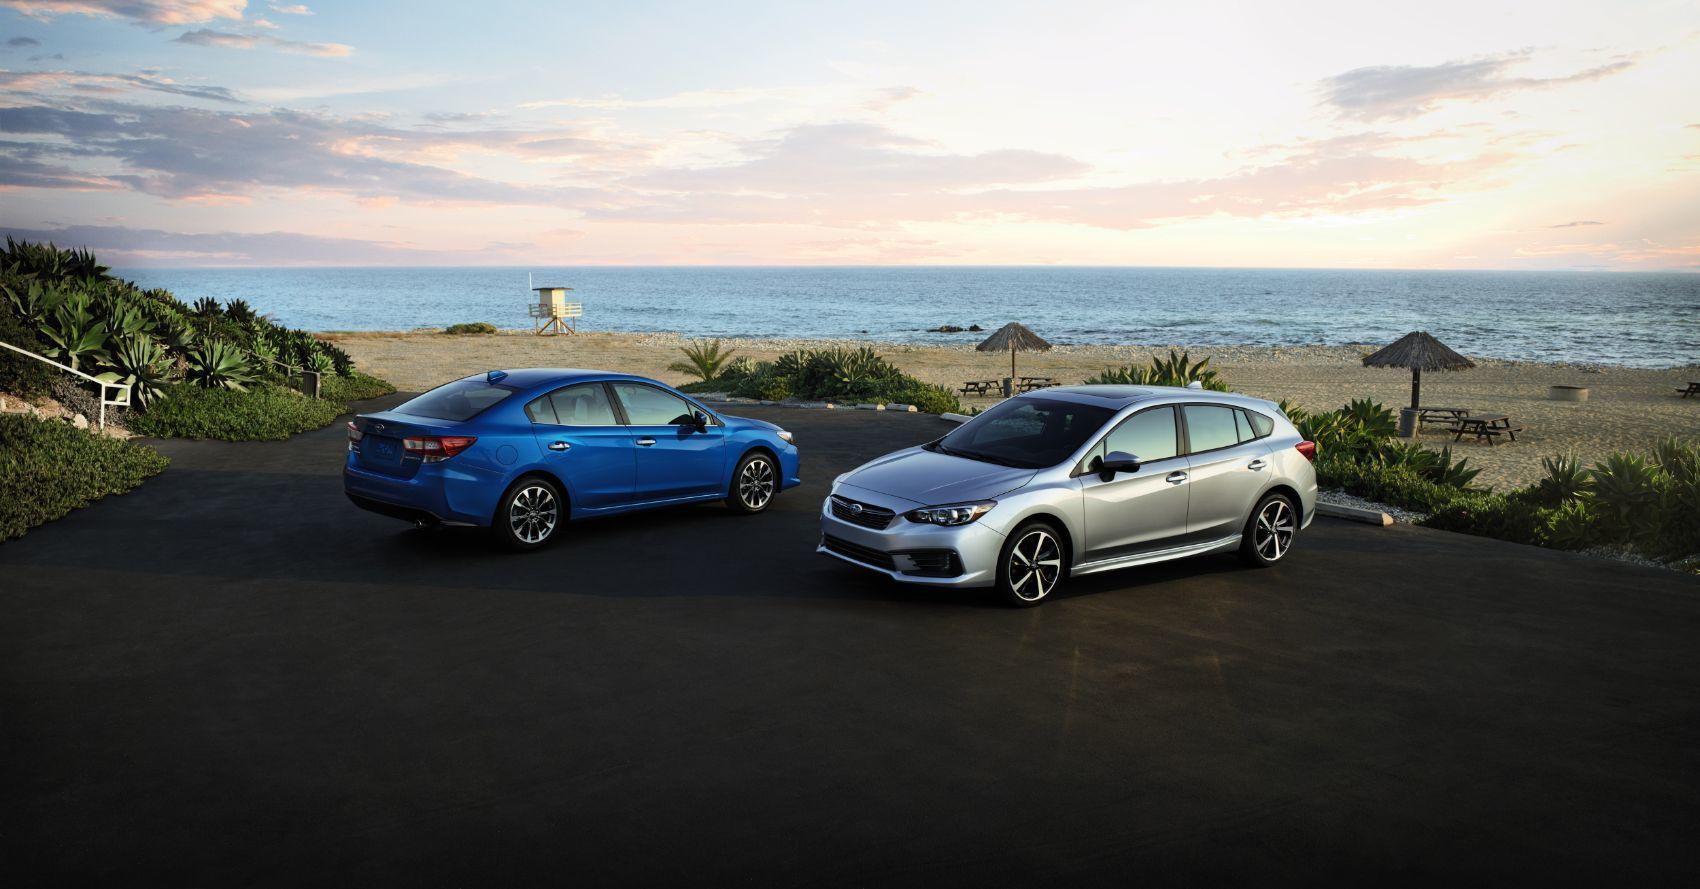 2021 Subaru Impreza 1